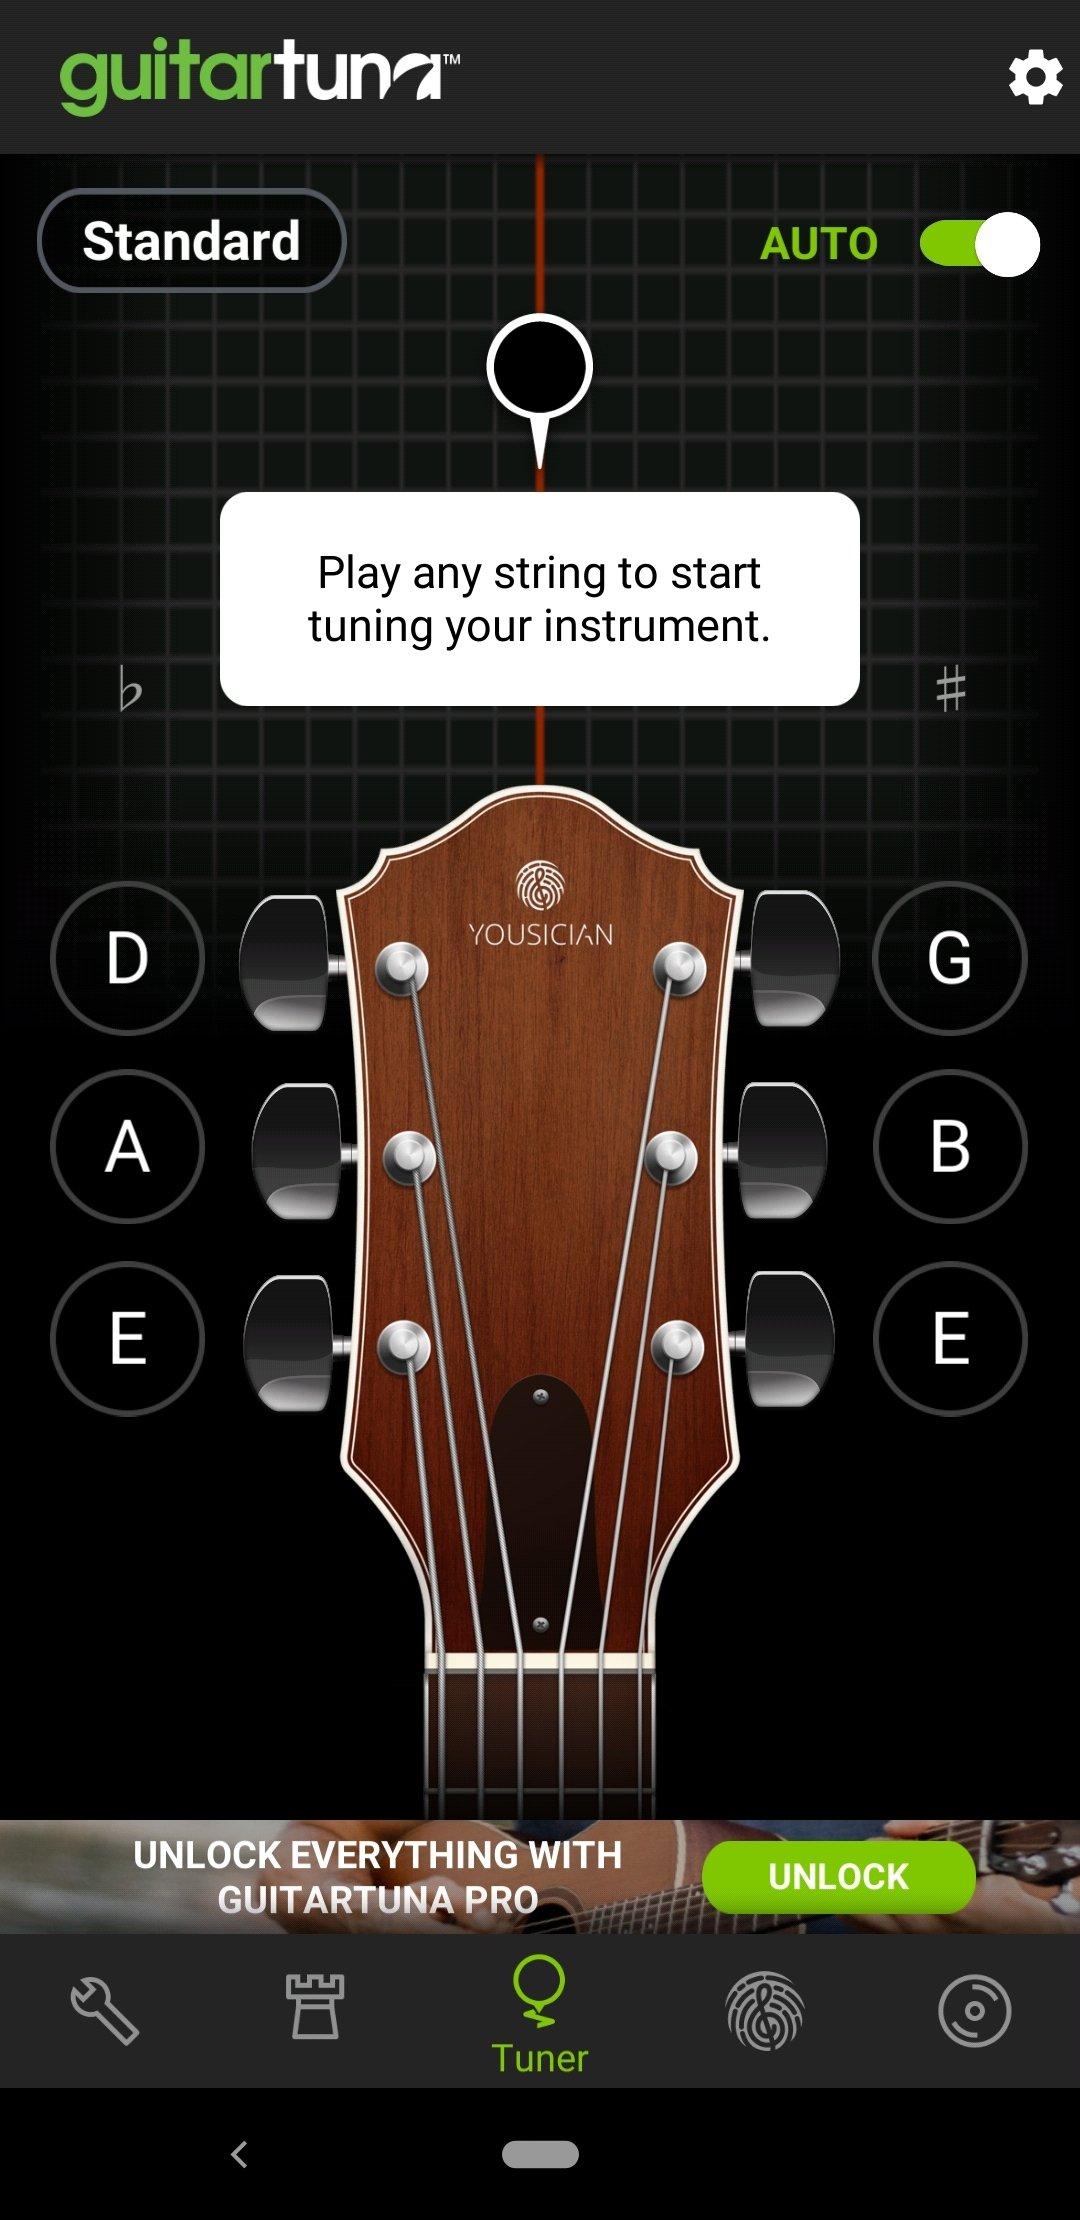 Aplikasi Setel Kunci Gitar : aplikasi, setel, kunci, gitar, Aplikasi, Gitar, Terbaik, Untuk, Android, Dimainkan!, TribunStyle.com